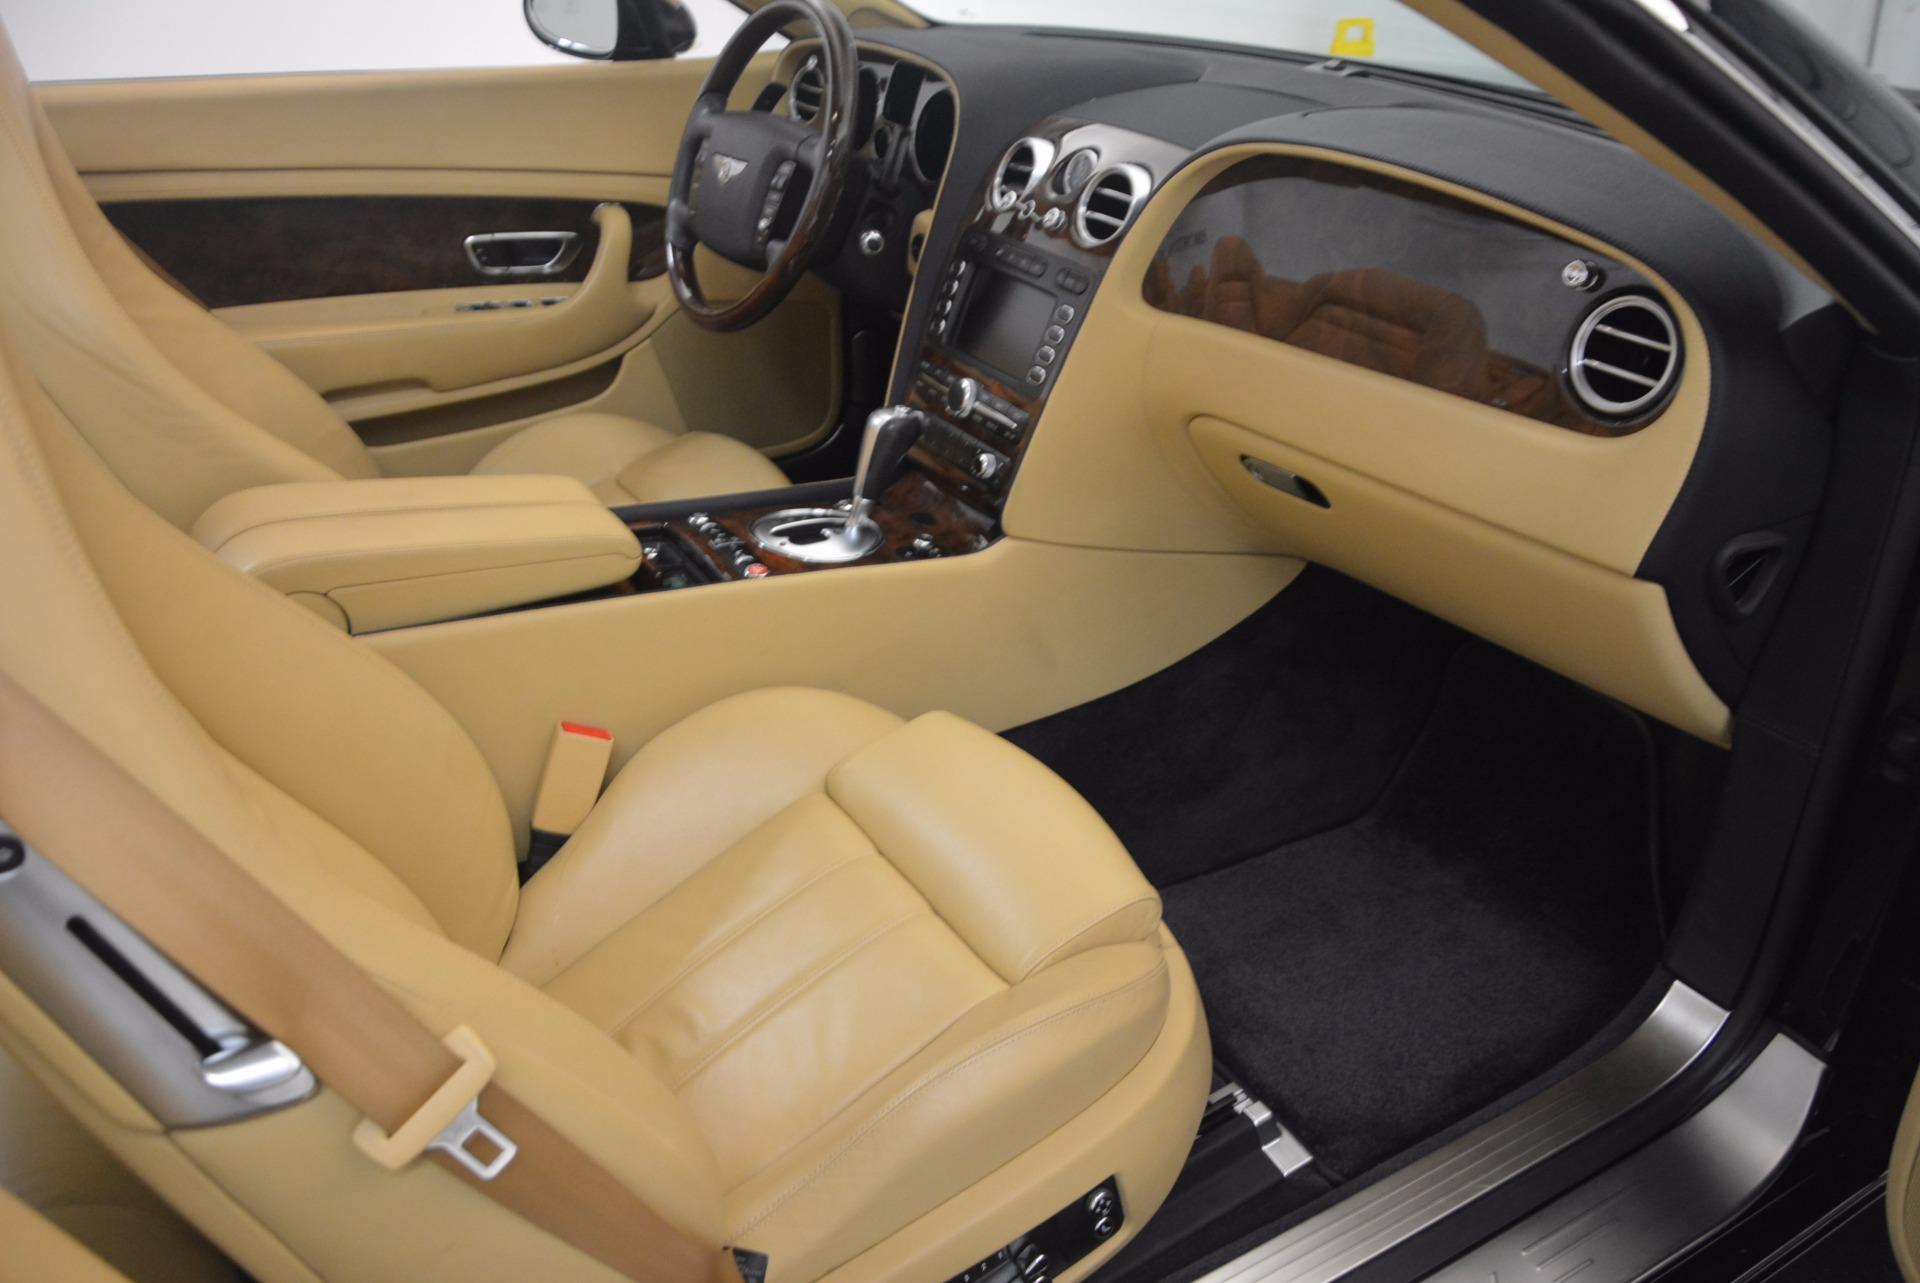 Used 2007 Bentley Continental GTC  For Sale In Westport, CT 1186_p46